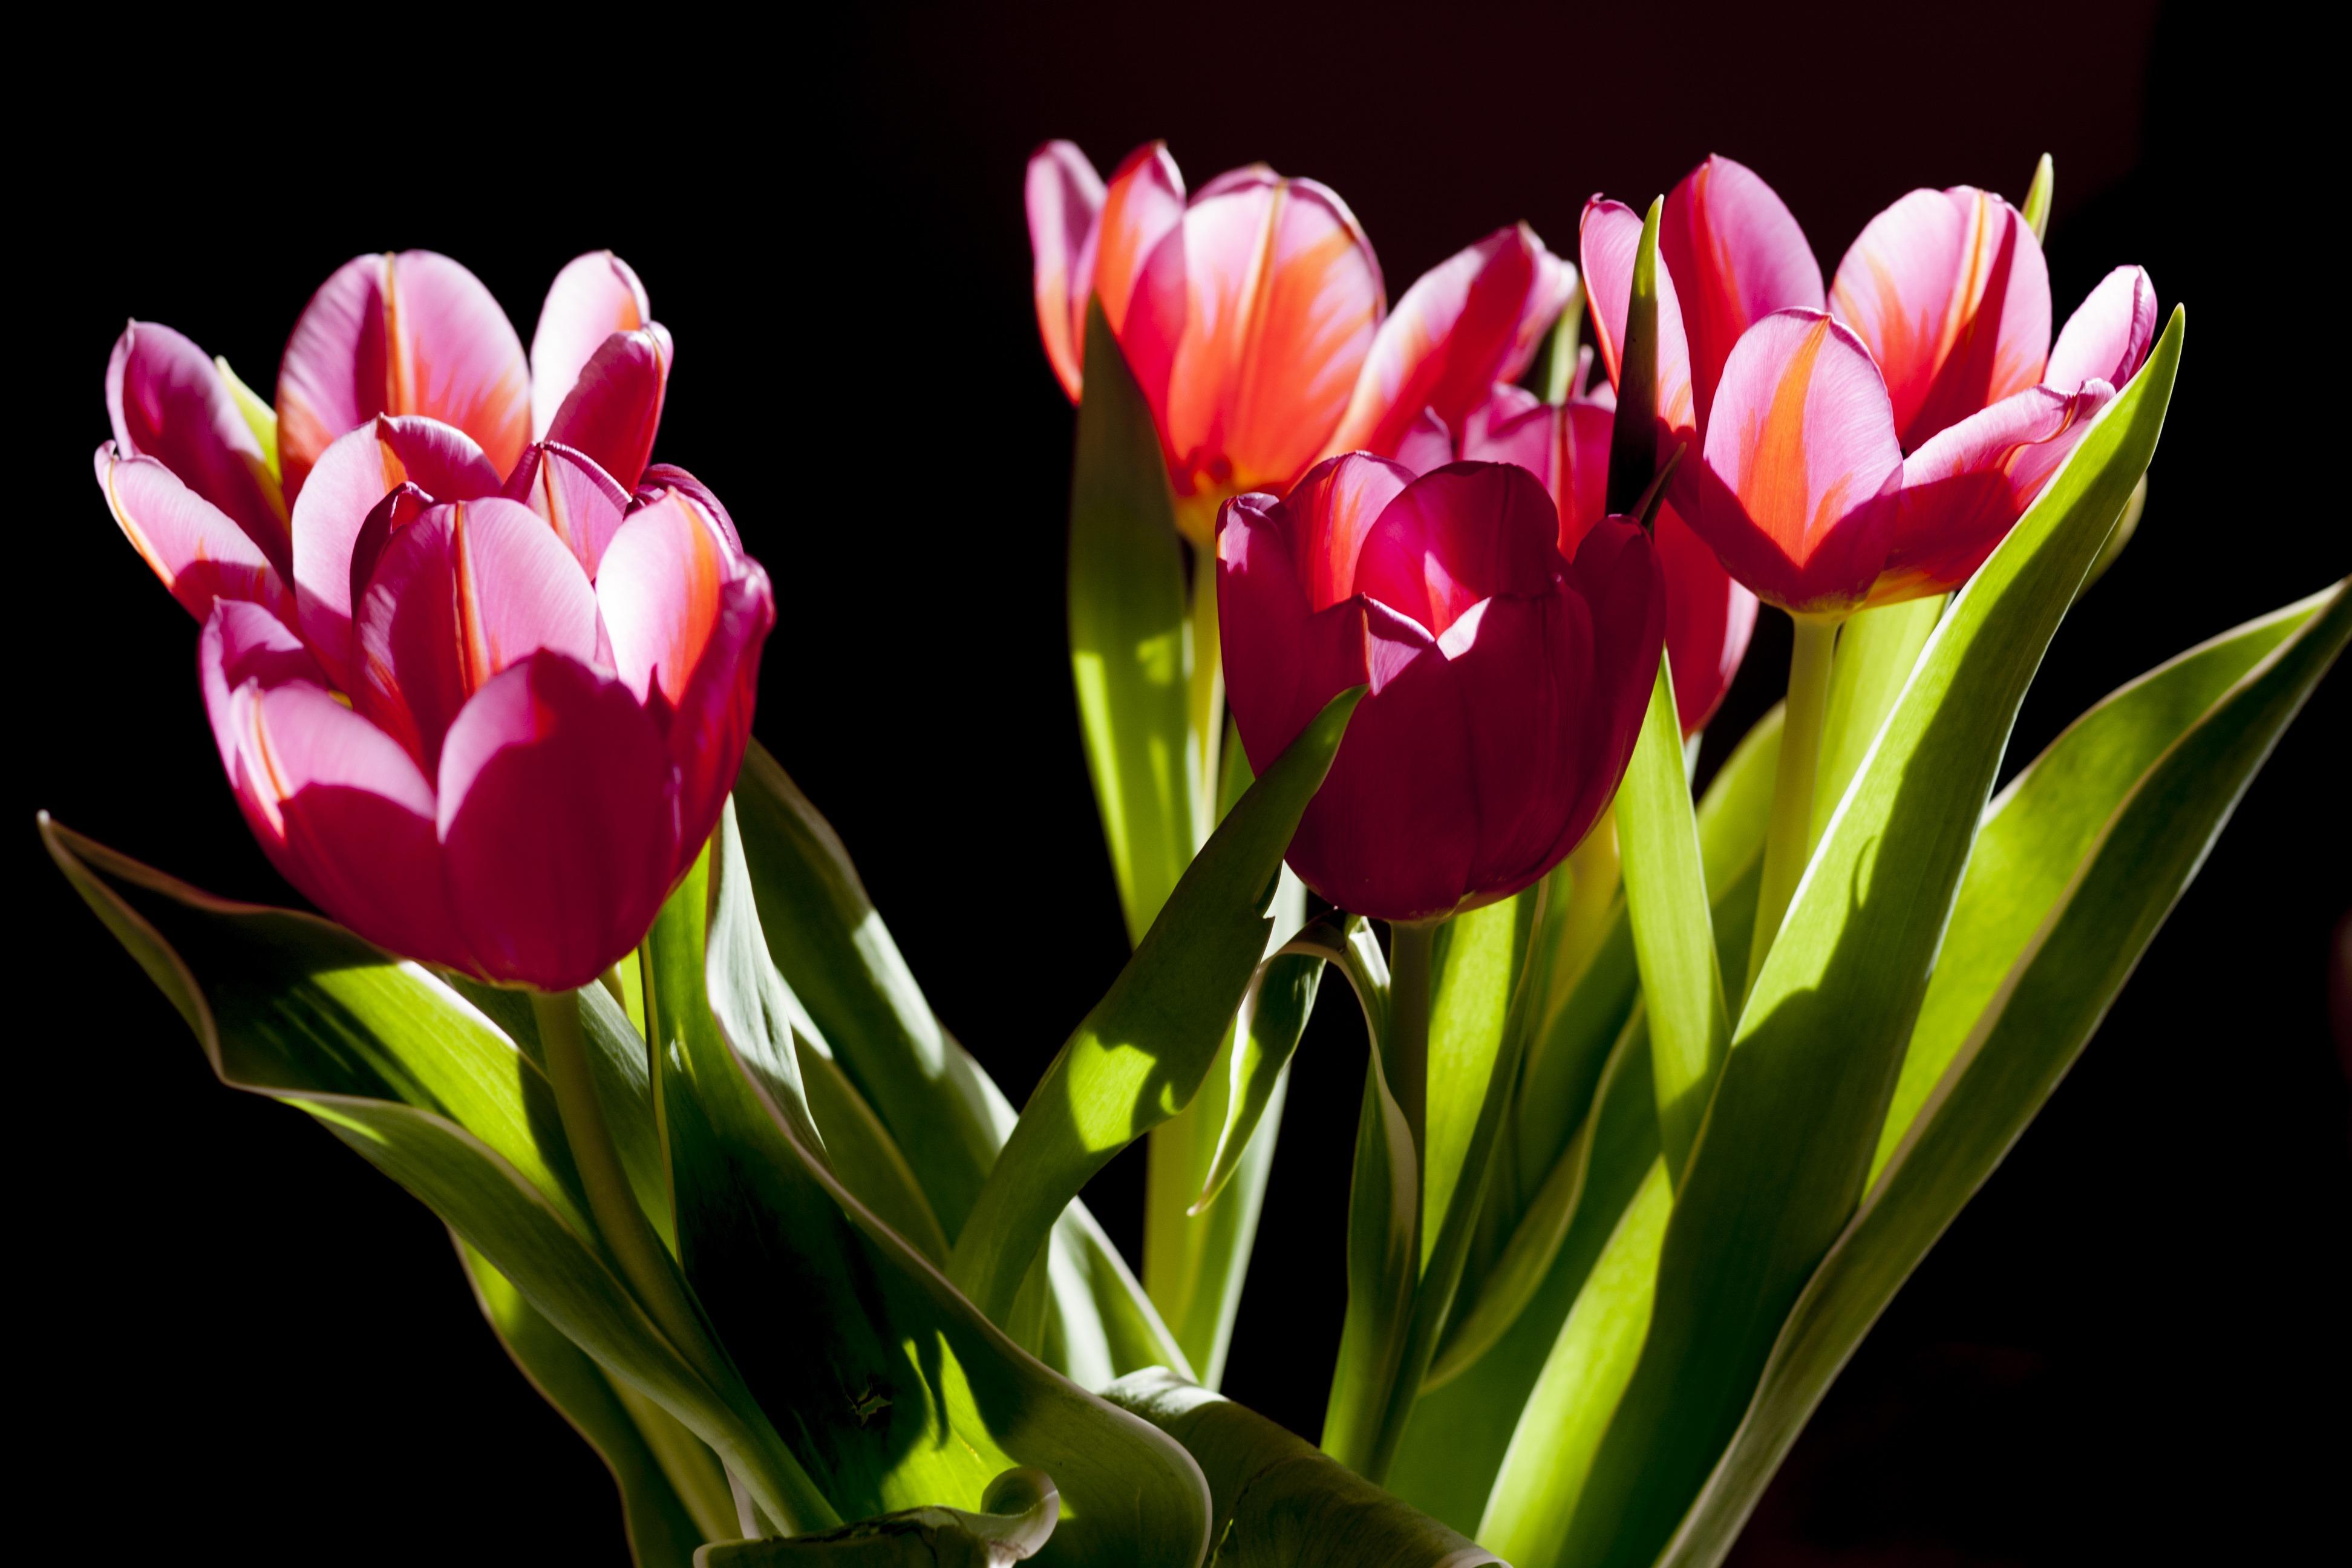 tulips-flowers-plant-beauty-59987